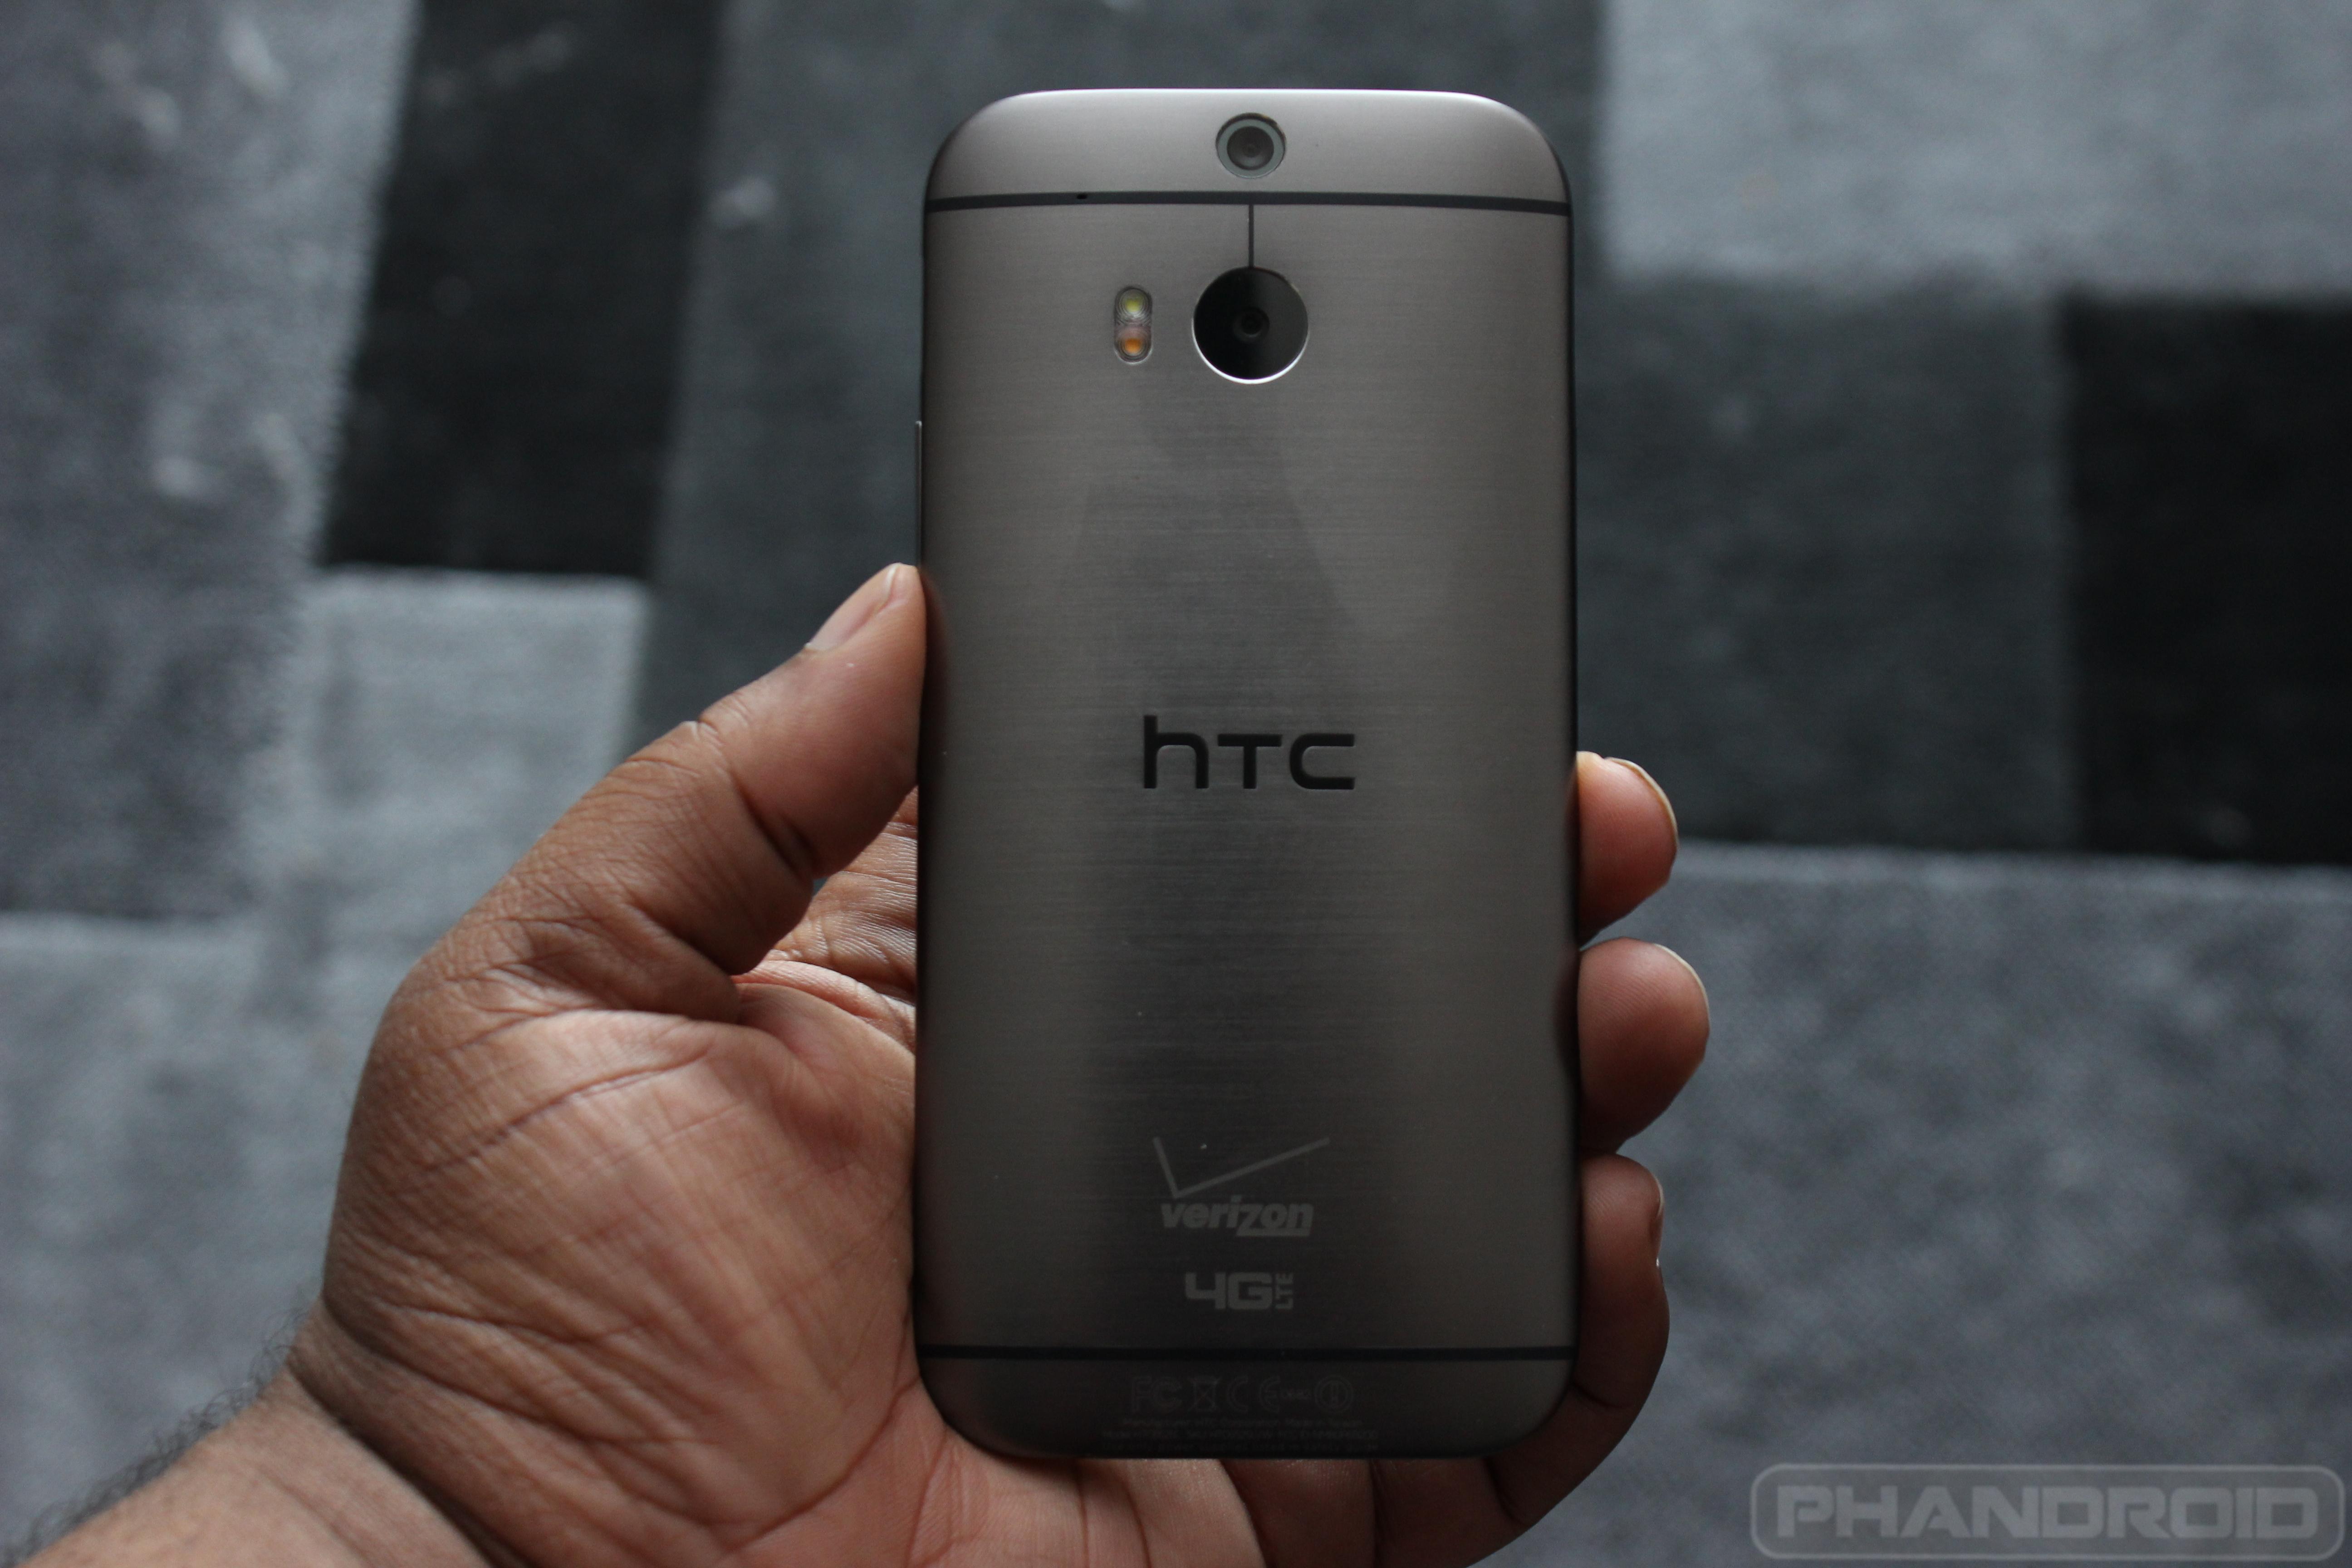 Download HTC ONE M8 Drivers for Windows (USB + ADB)